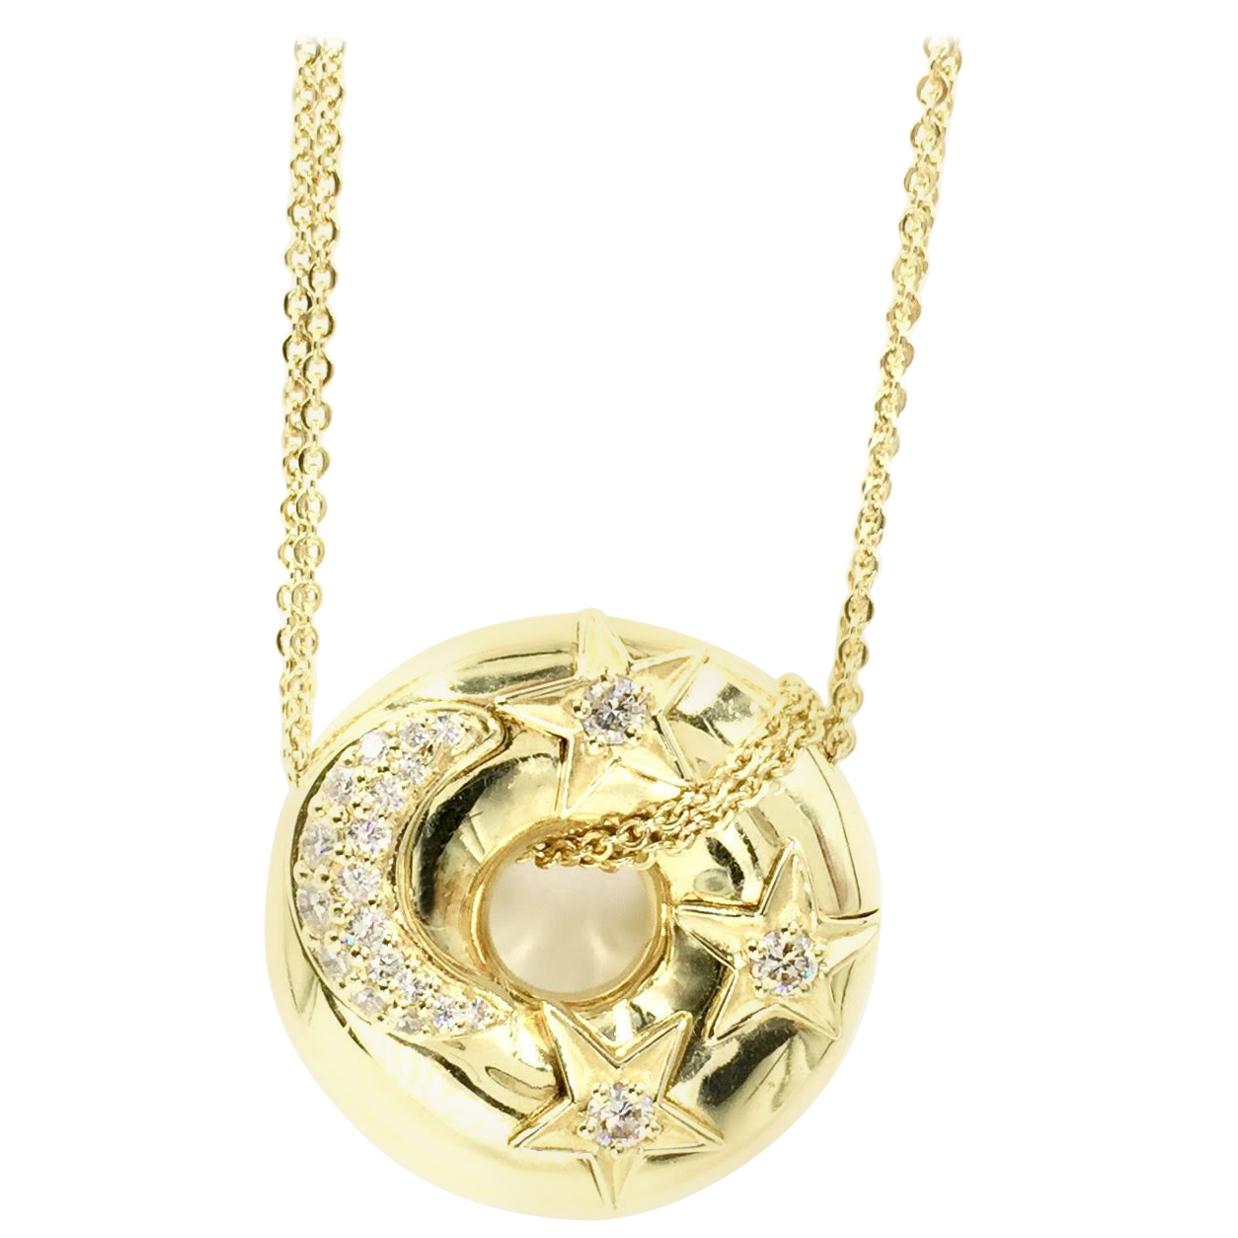 Diamond Celestial 18 Karat Gold Pendant Necklace